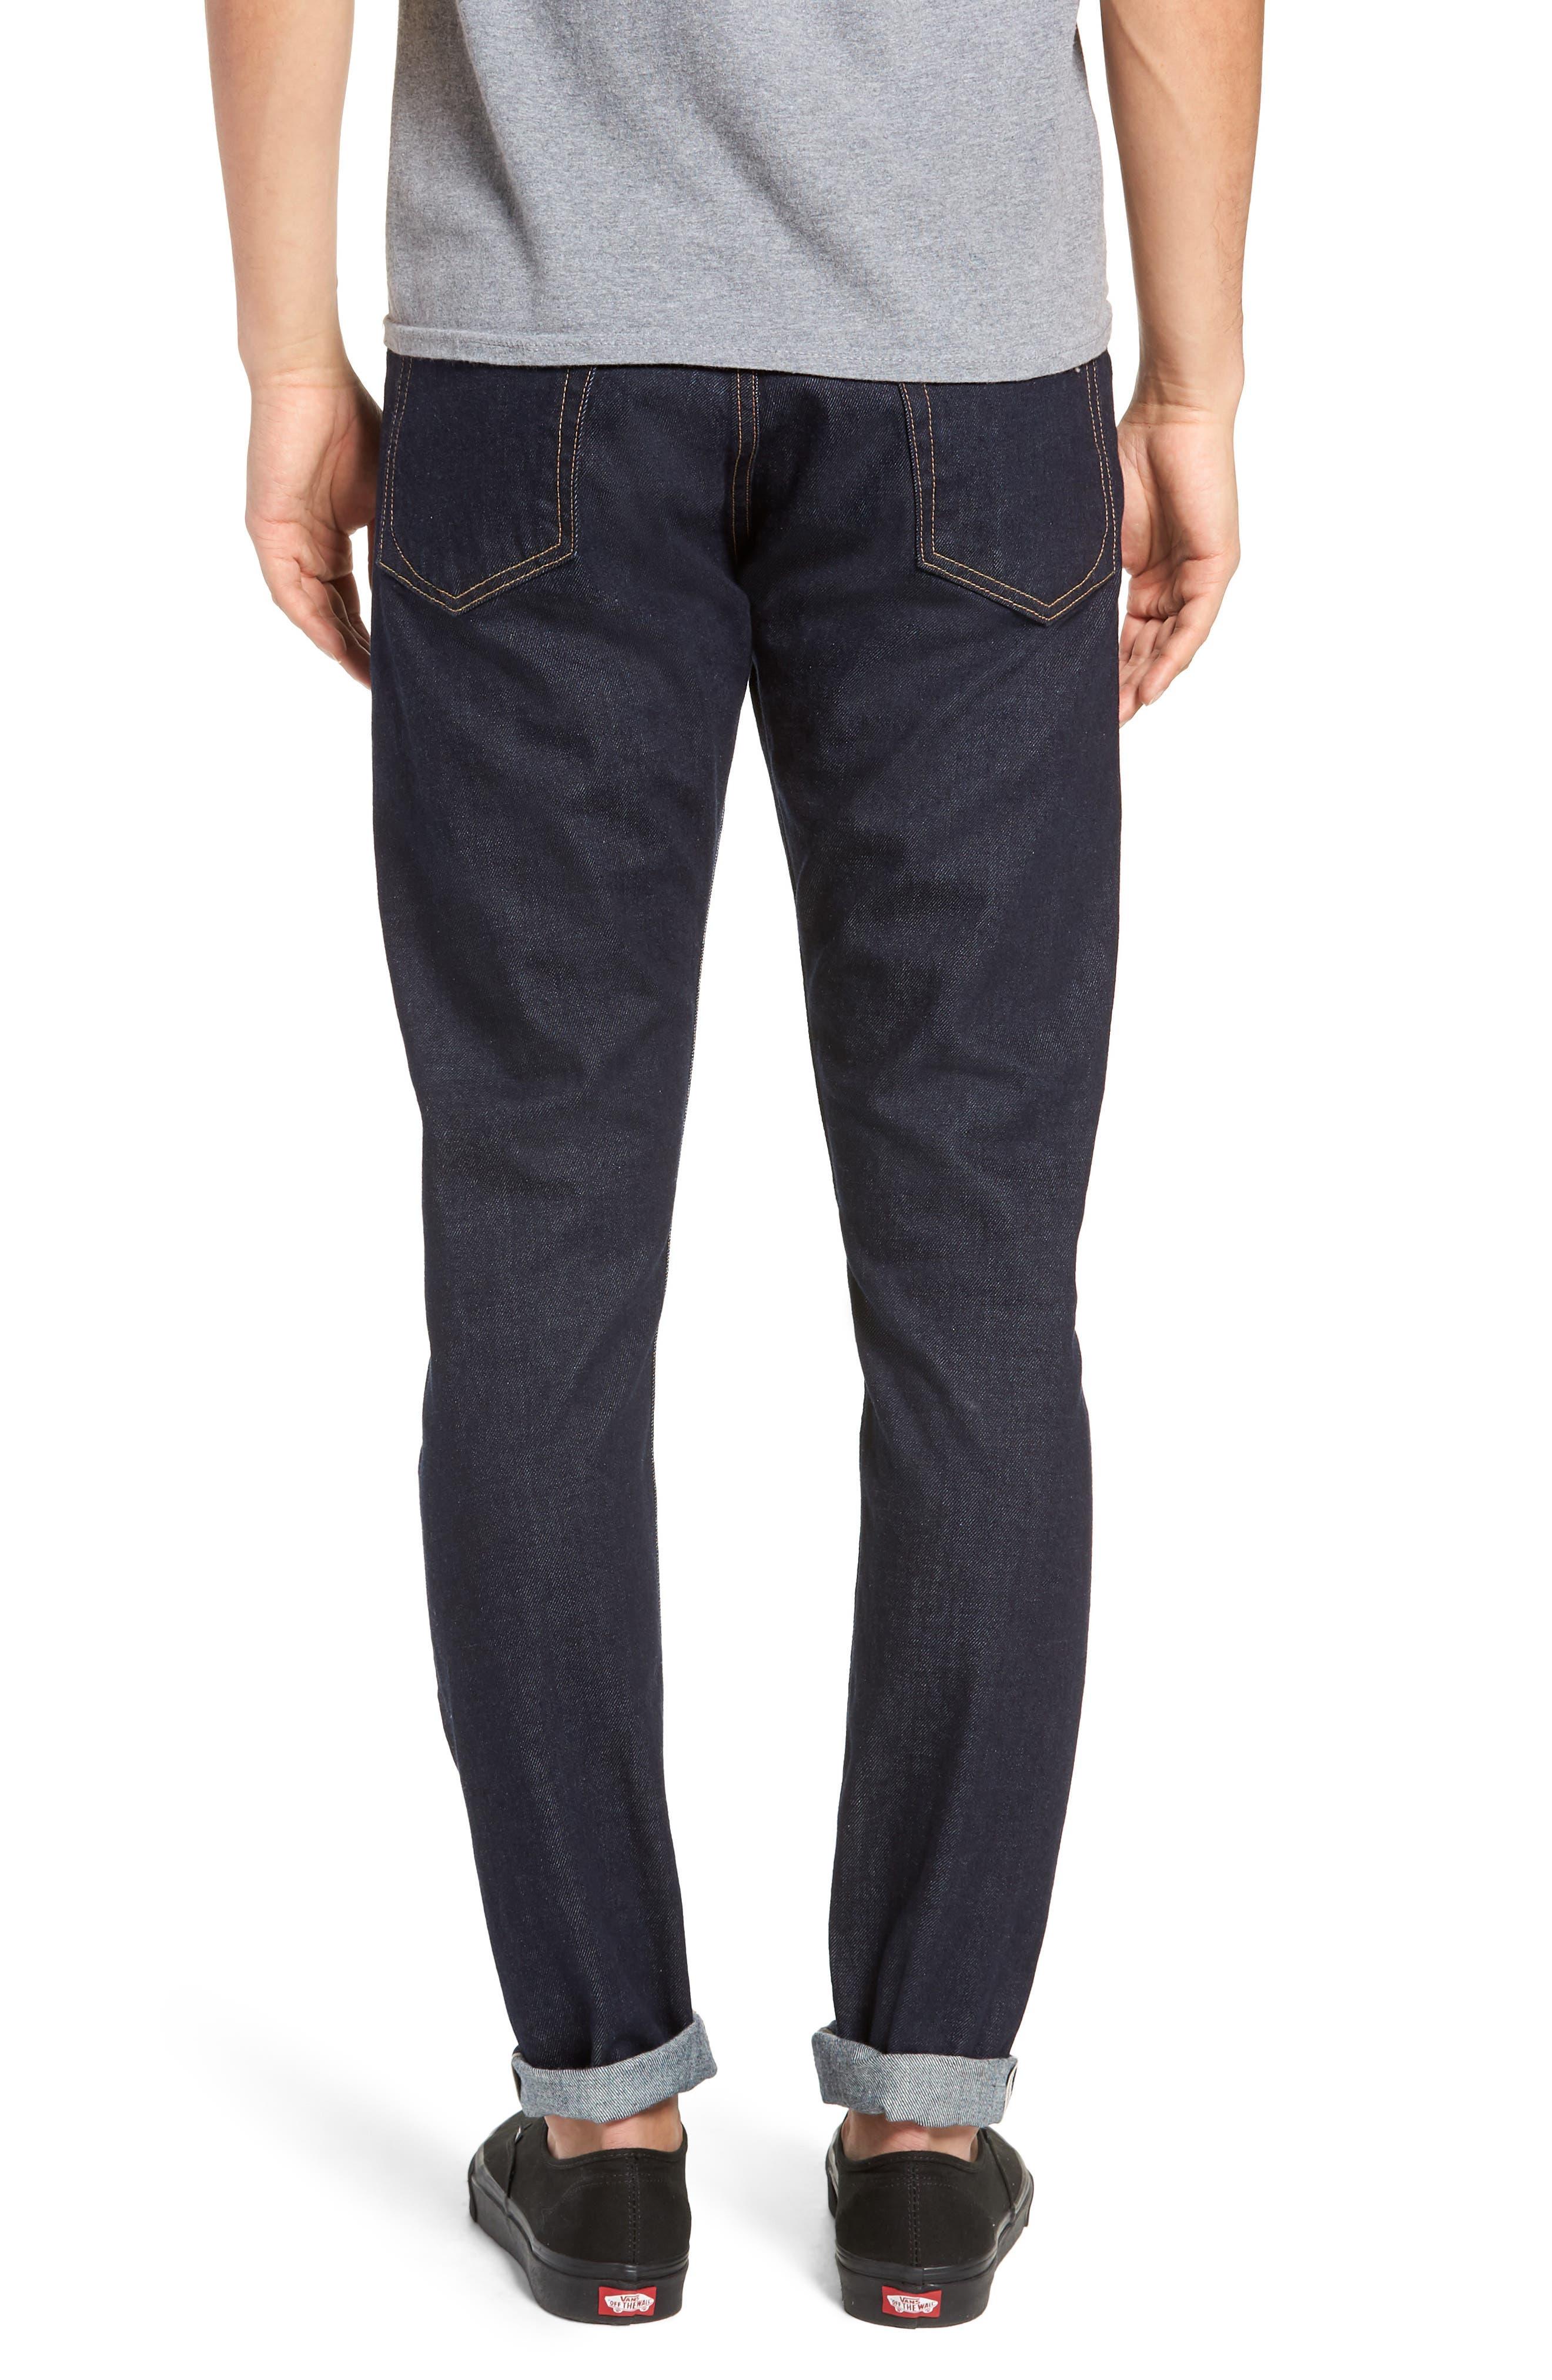 Fit 1 Skinny Fit Jeans,                             Alternate thumbnail 2, color,                             INDIGO RINSE SELVEDGE